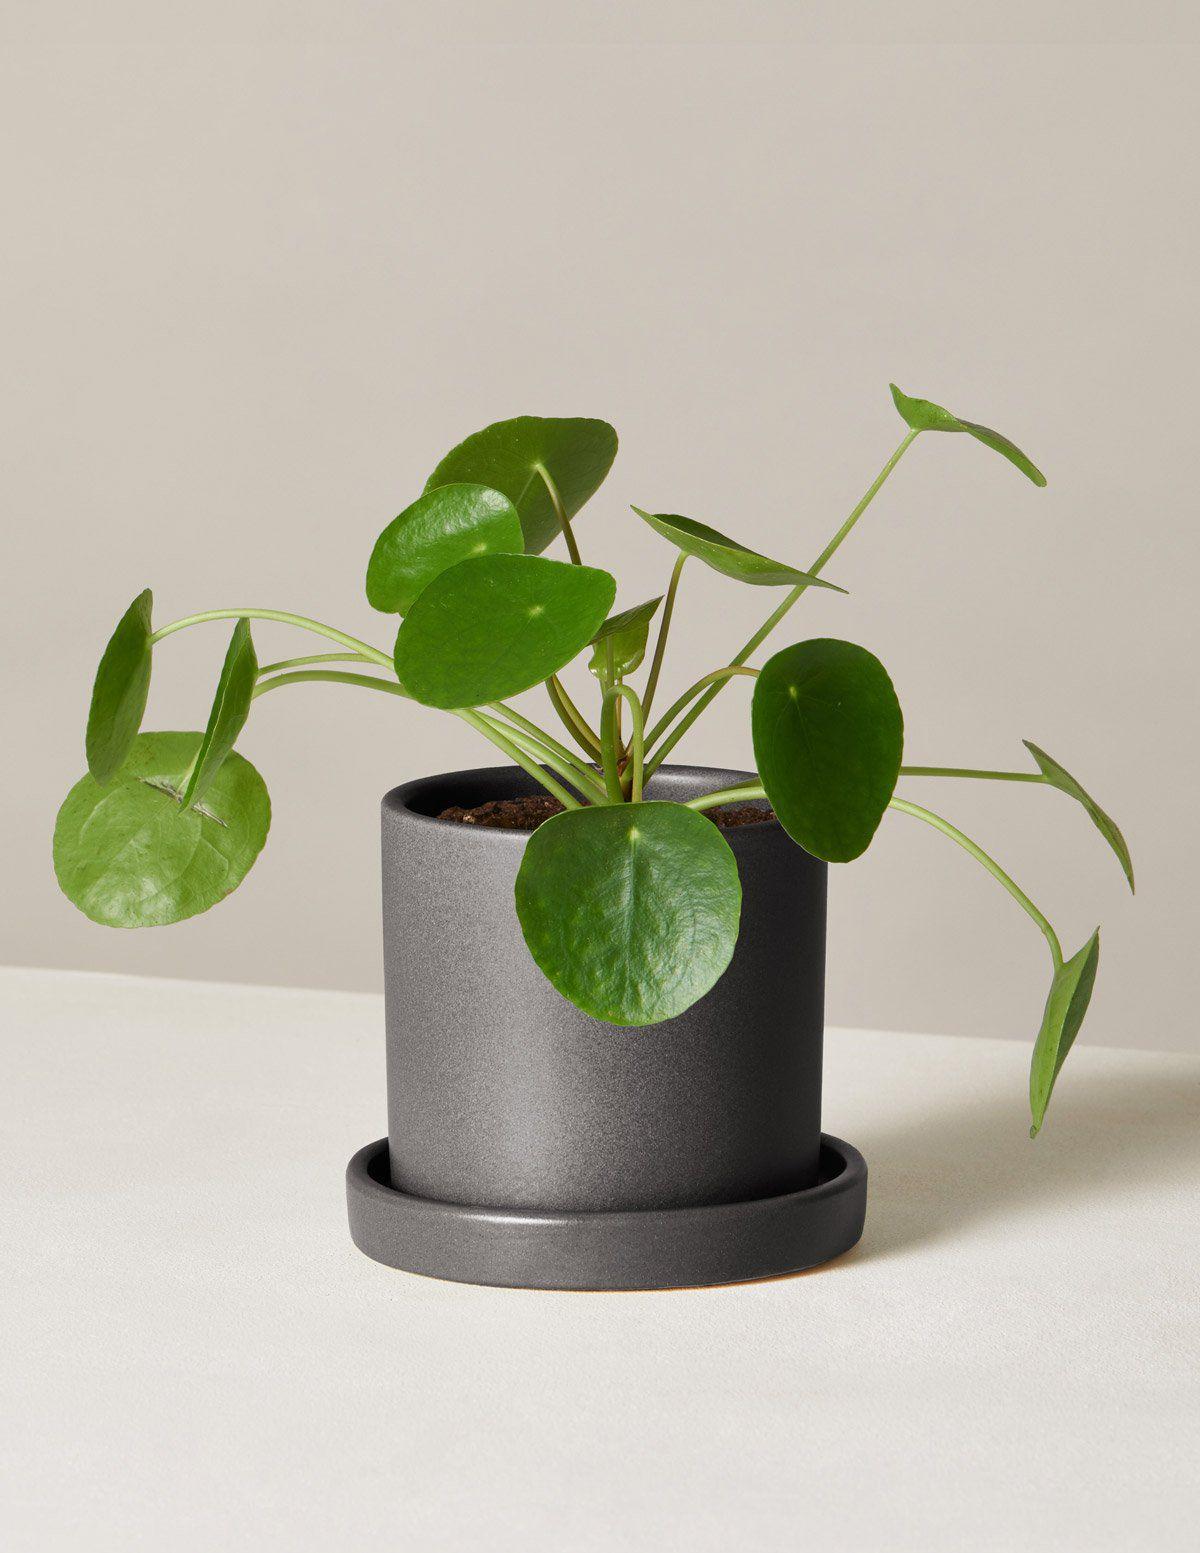 Pilea peperomioides in a black ceramic pot